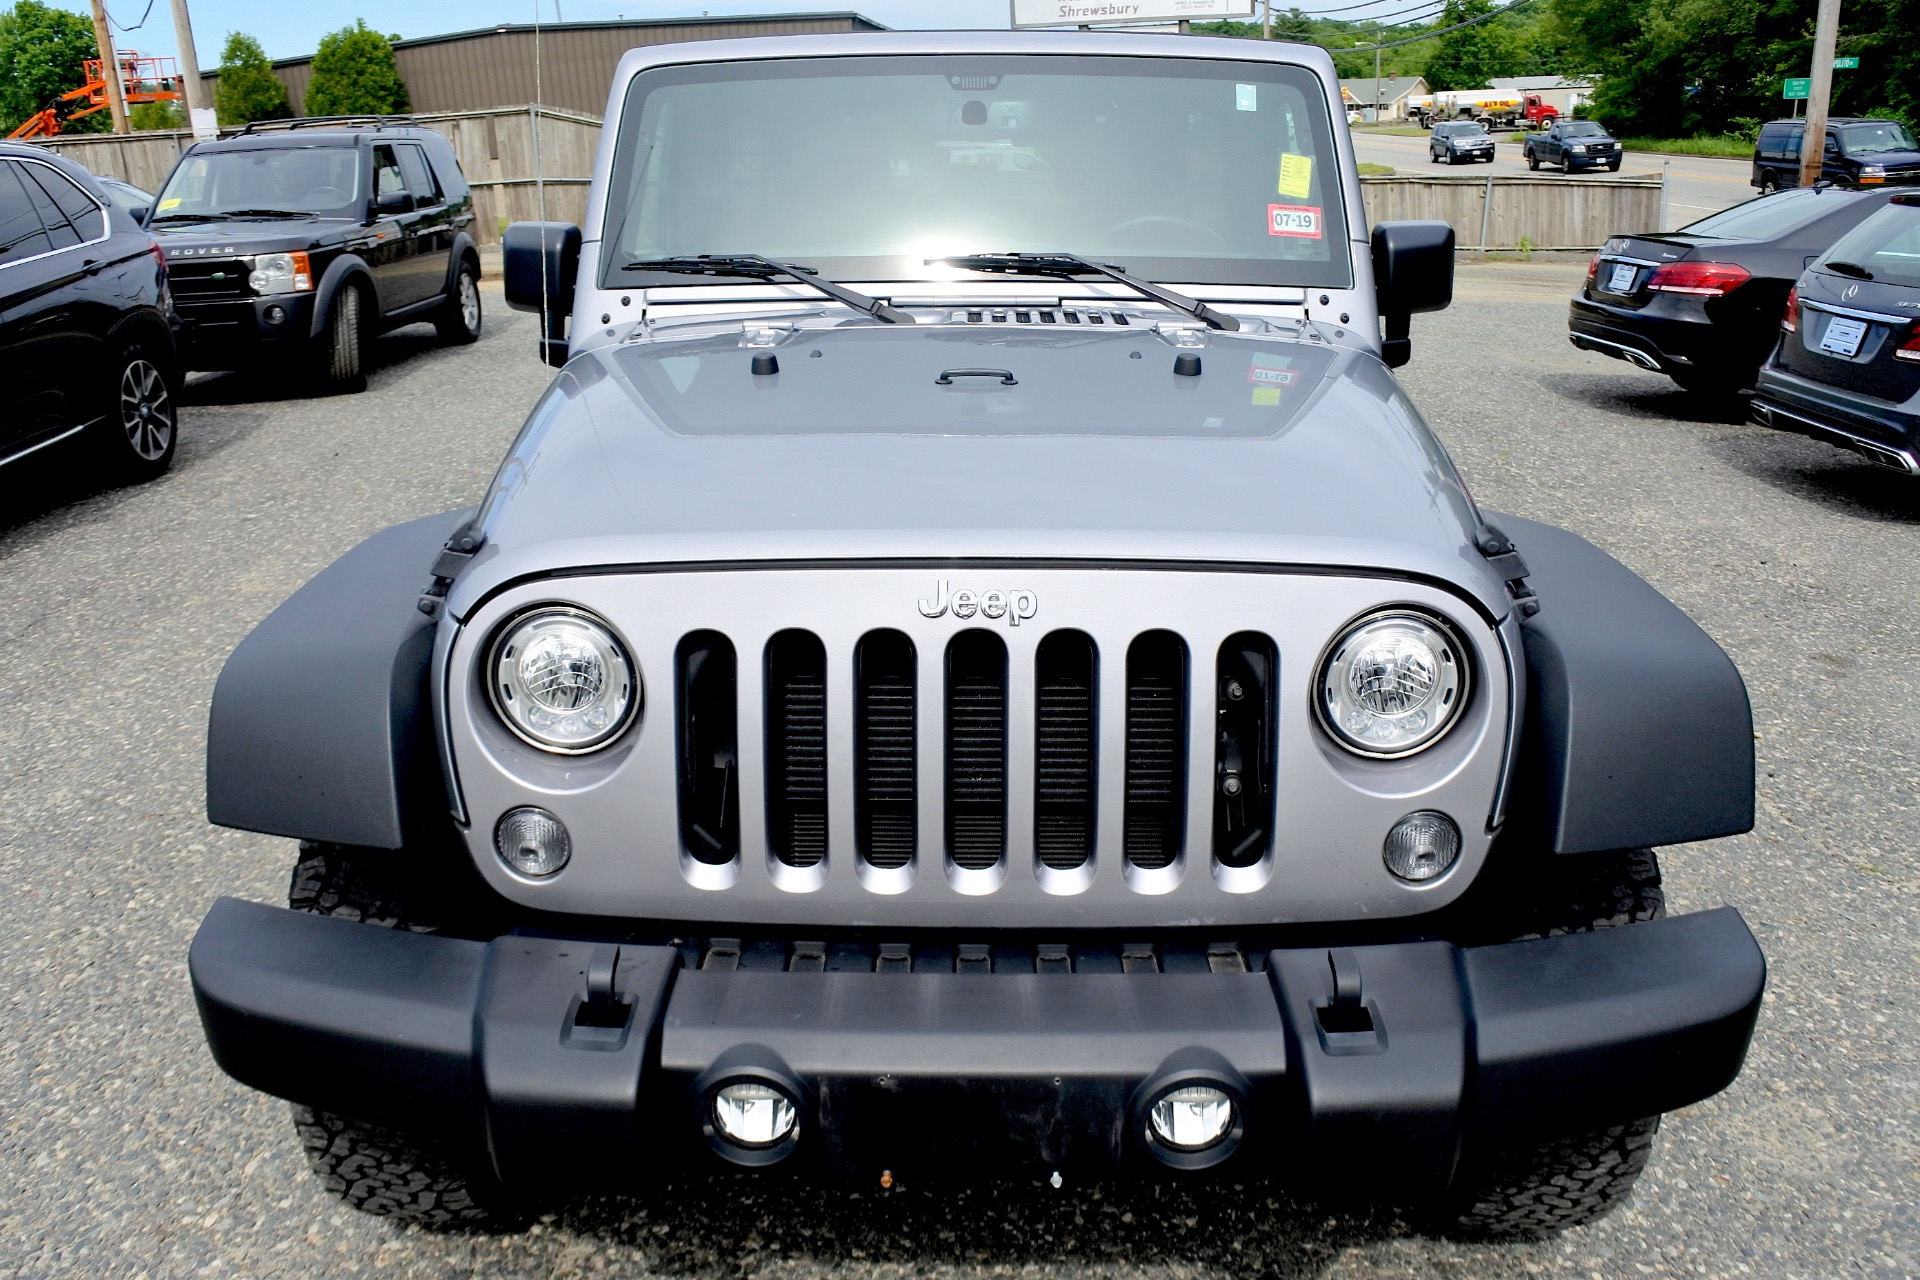 Used 2017 Jeep Wrangler Unlimited Sport 4x4 Used 2017 Jeep Wrangler Unlimited Sport 4x4 for sale  at Metro West Motorcars LLC in Shrewsbury MA 8